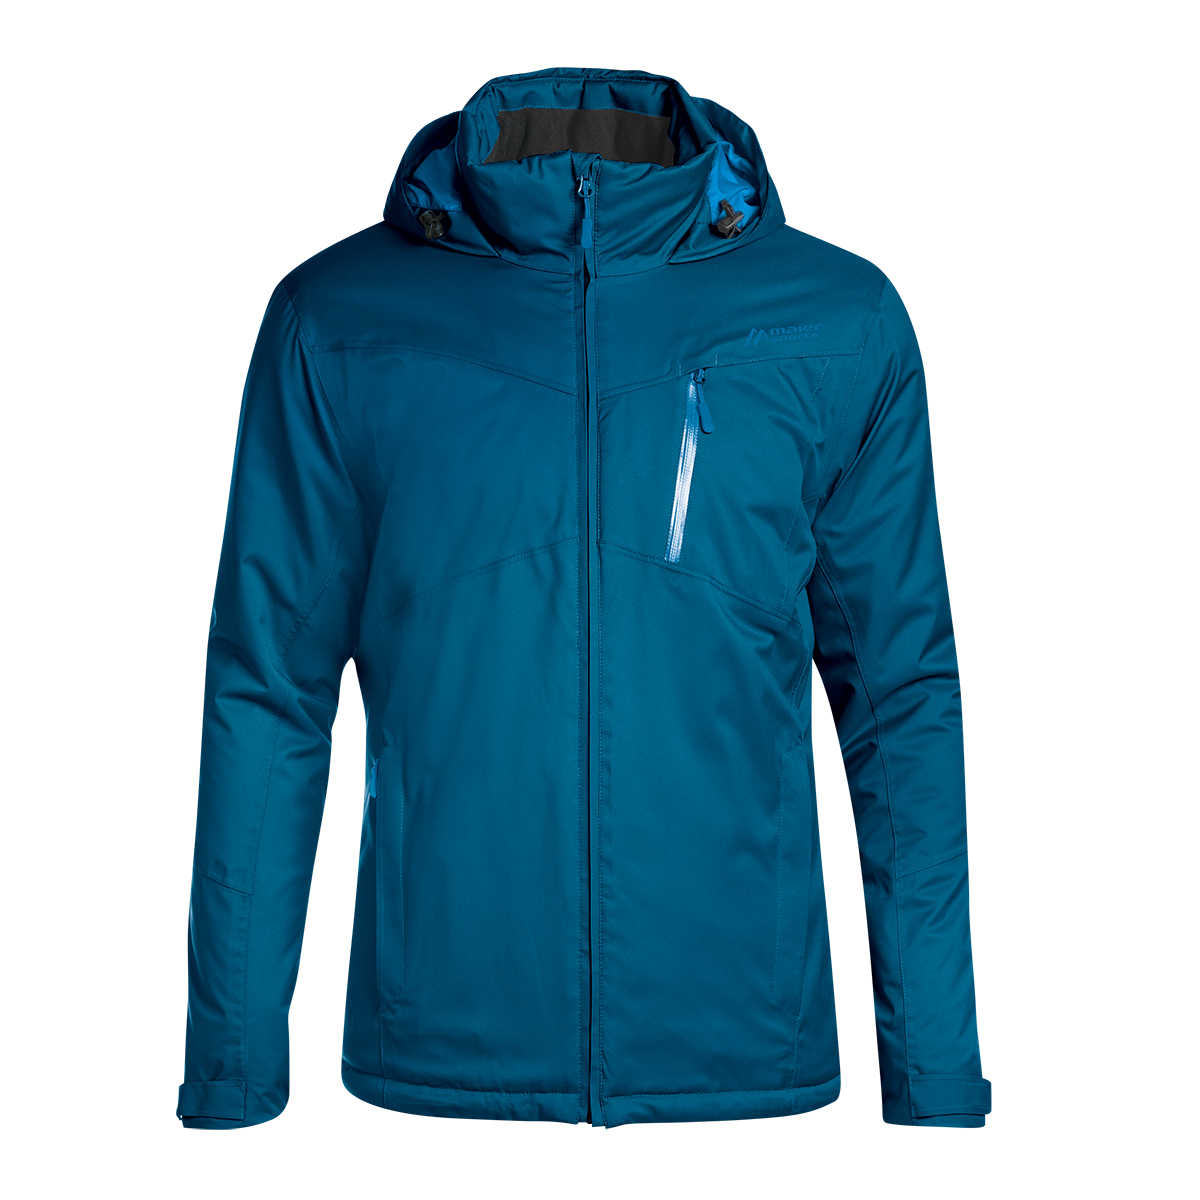 Luxus-Ästhetik Neuankömmlinge doppelter gutschein Maier Sports Multifunktions-Jacke in türkisblau